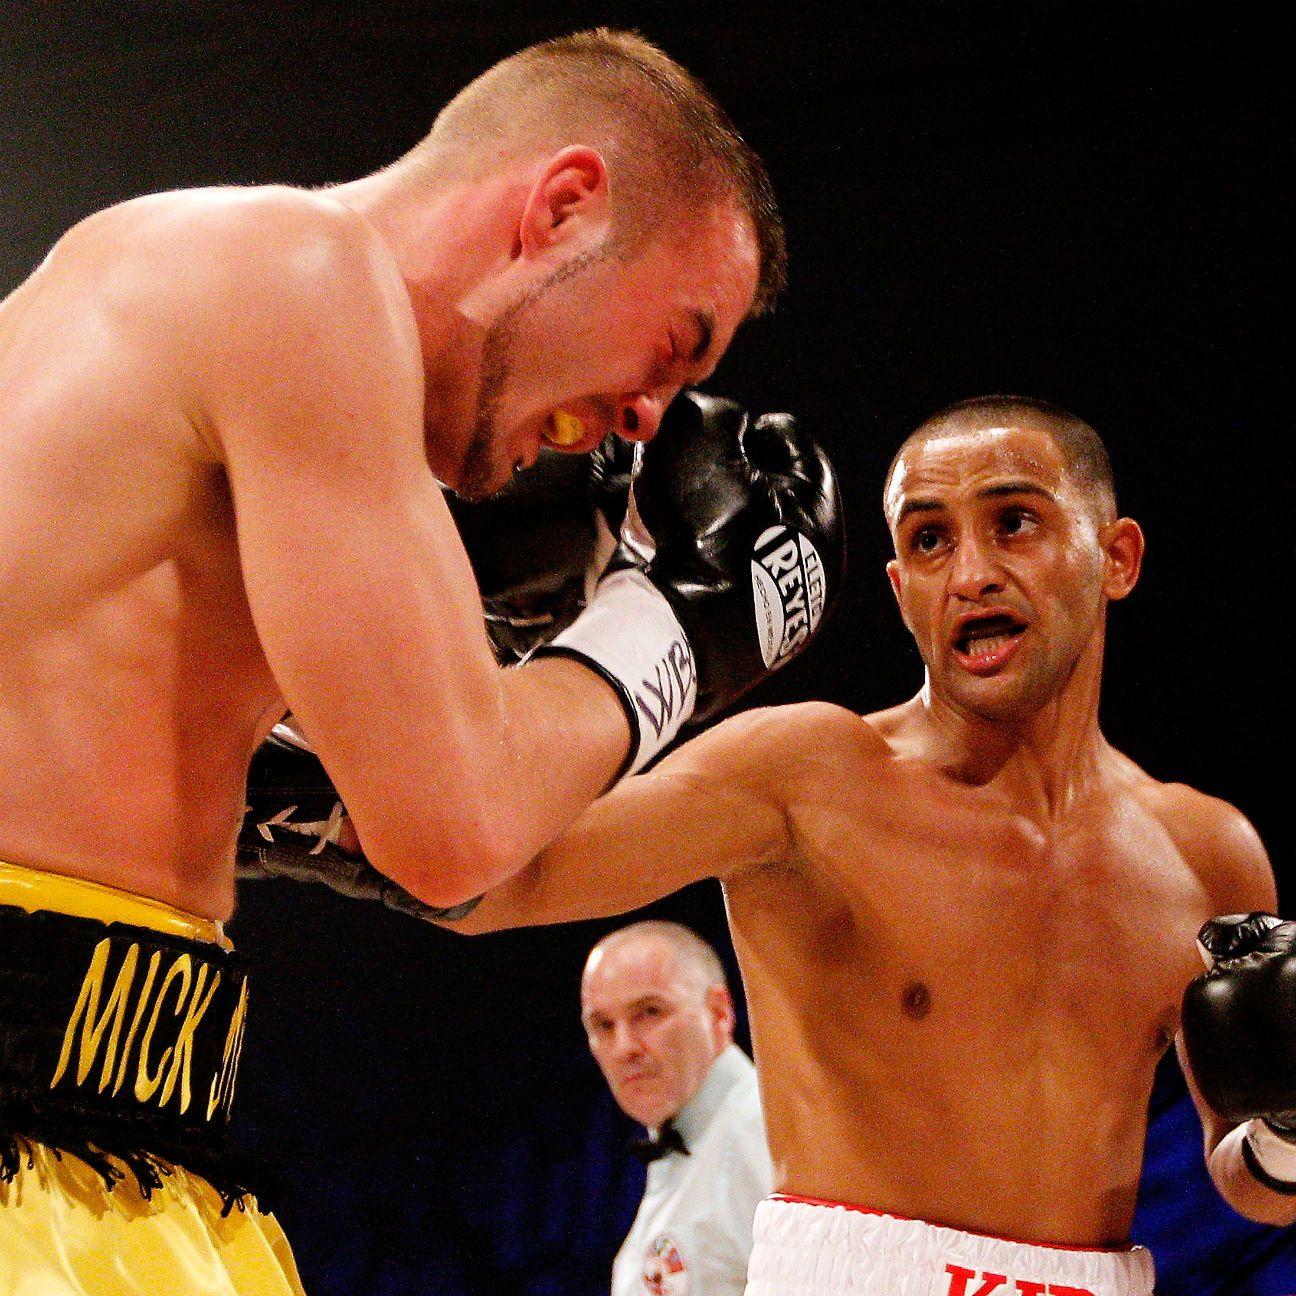 Doping Ban Upheld Against British Boxer Kid Galahad